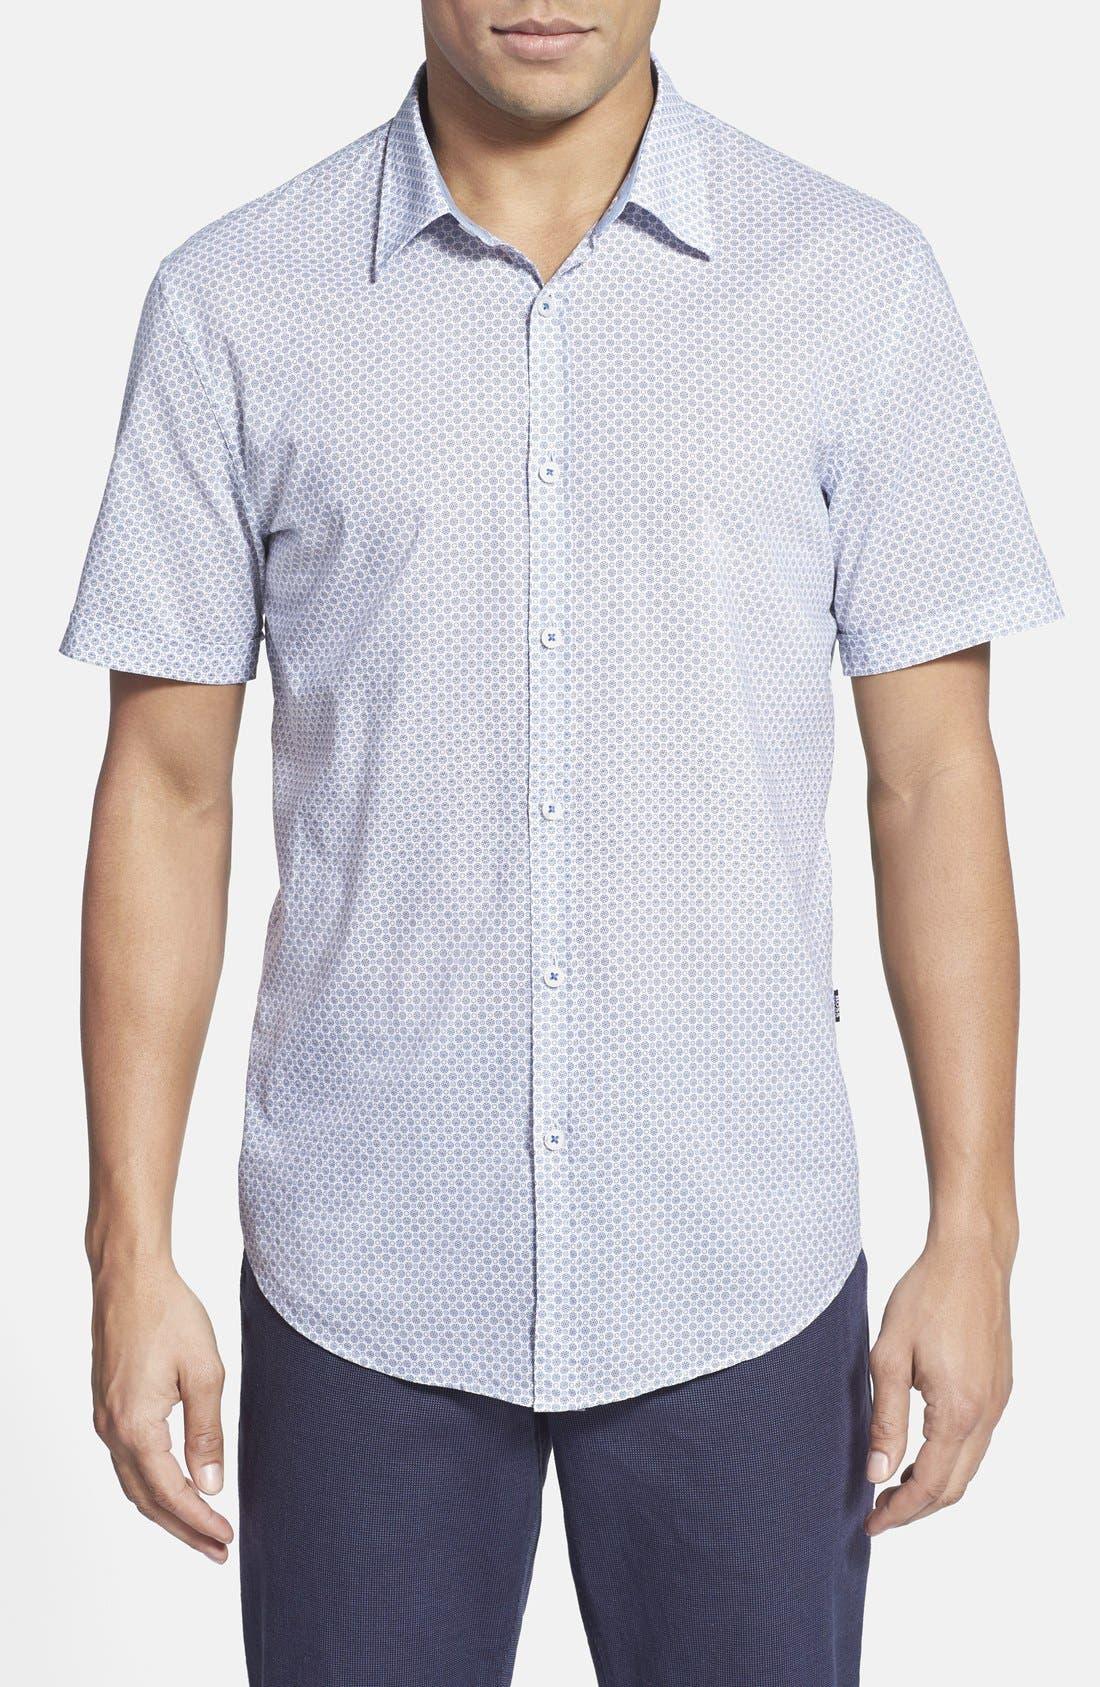 BOSS, 'Marco' Regular Fit Medallion Print Short Sleeve Sport Shirt, Main thumbnail 1, color, 431